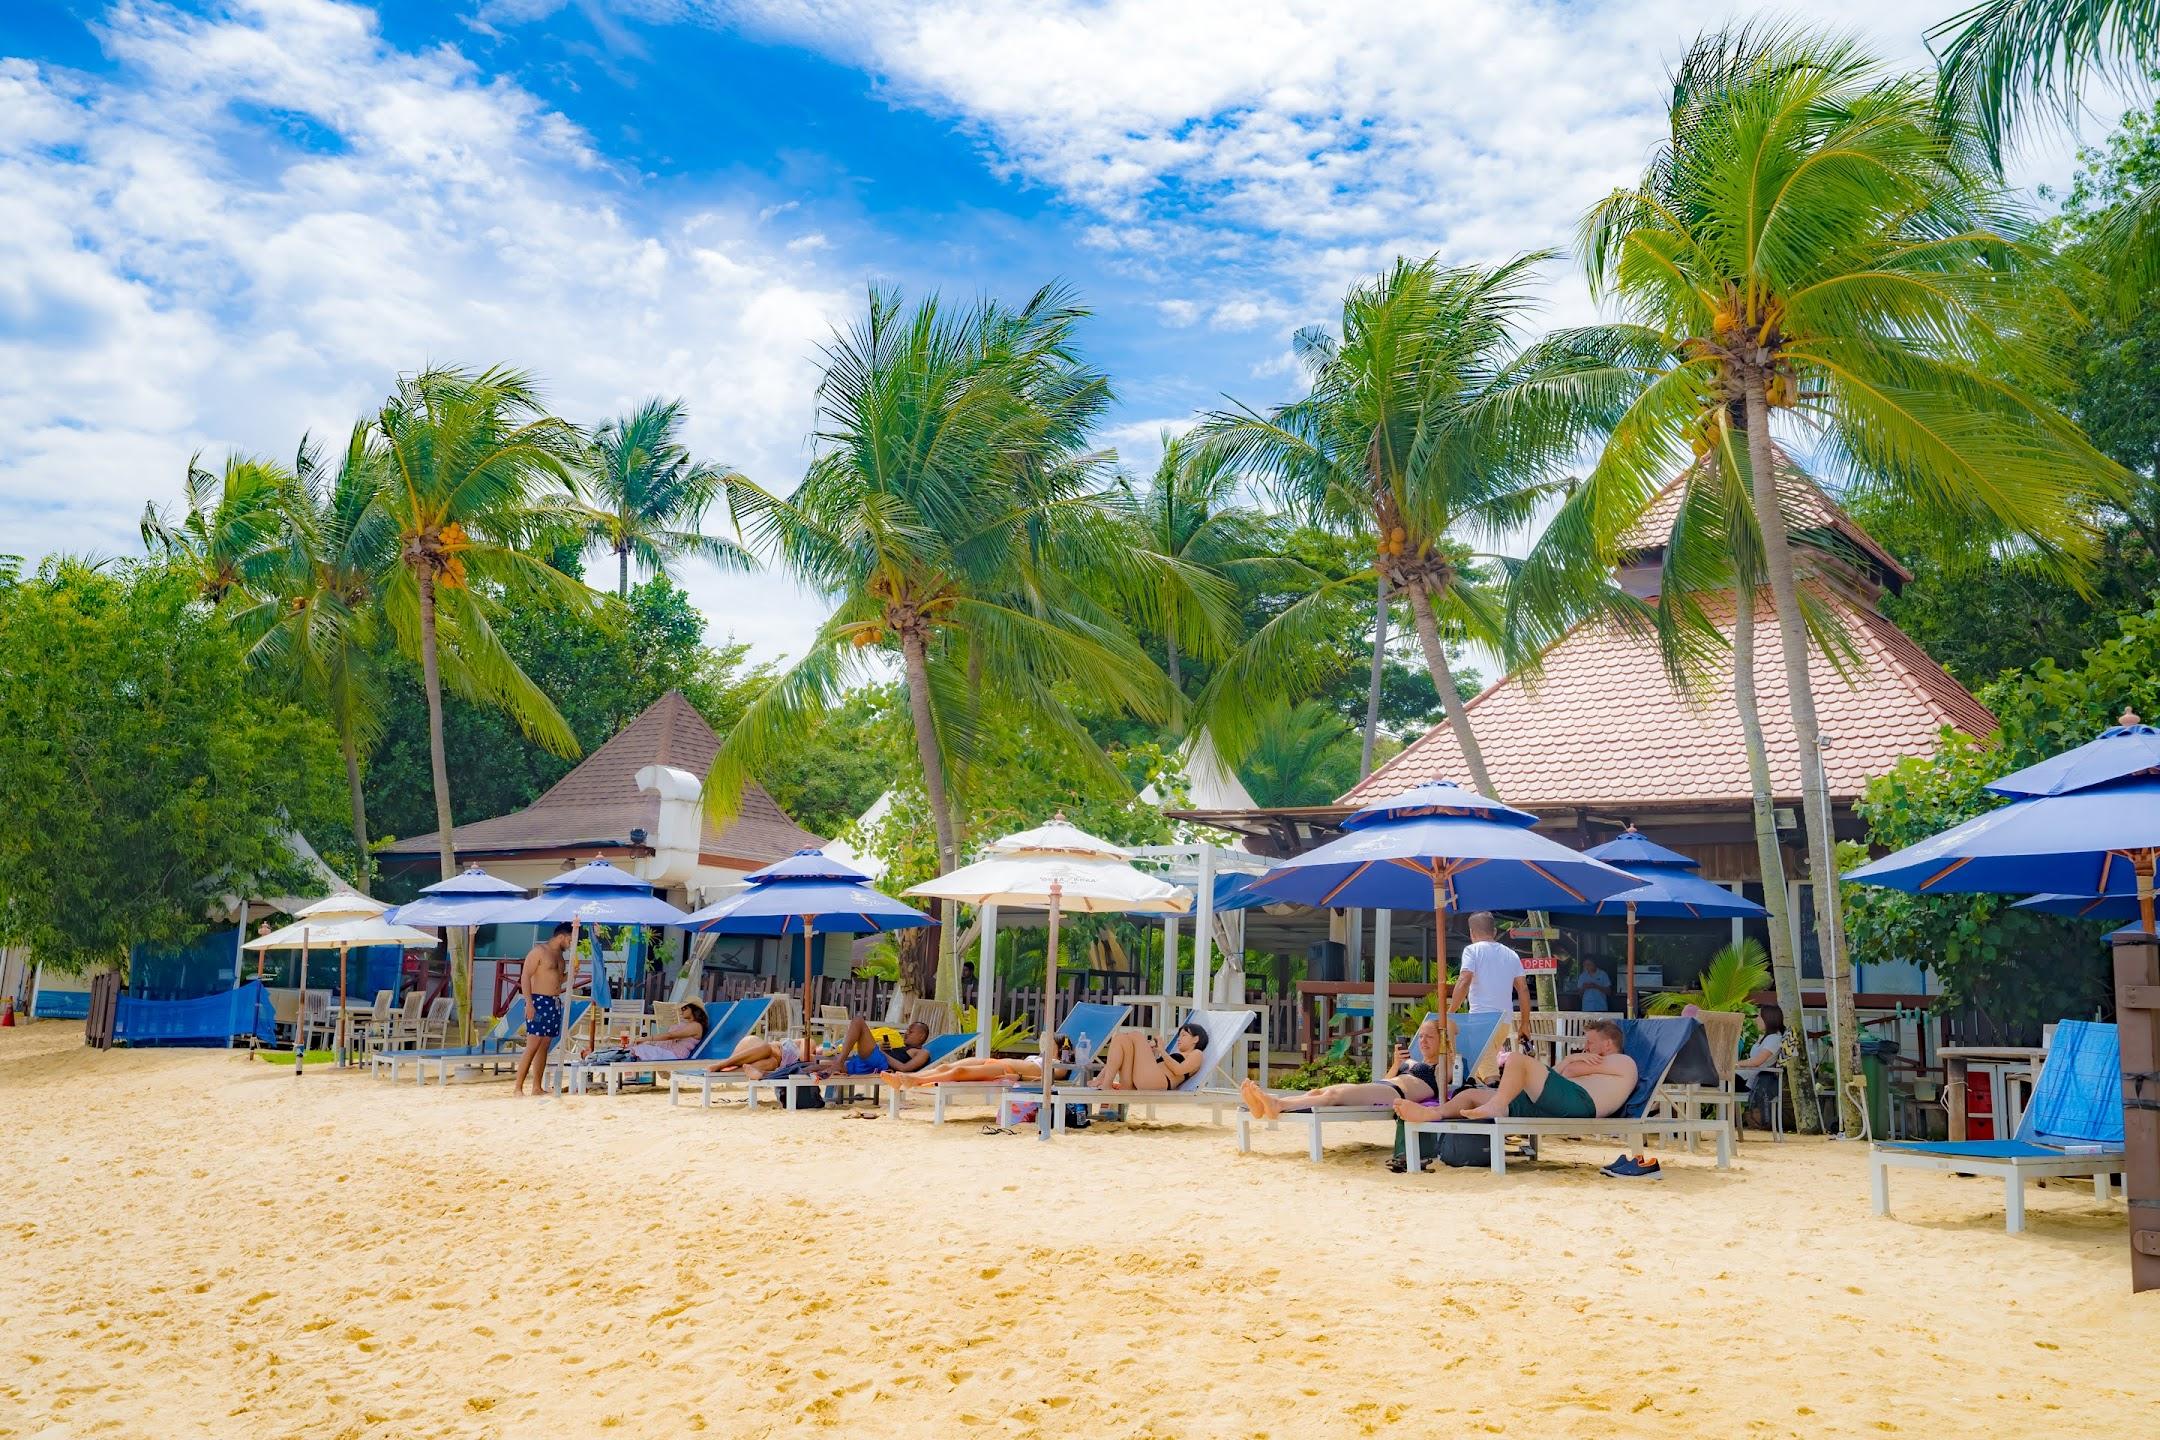 Singapore Sentosa Palawan Beach4